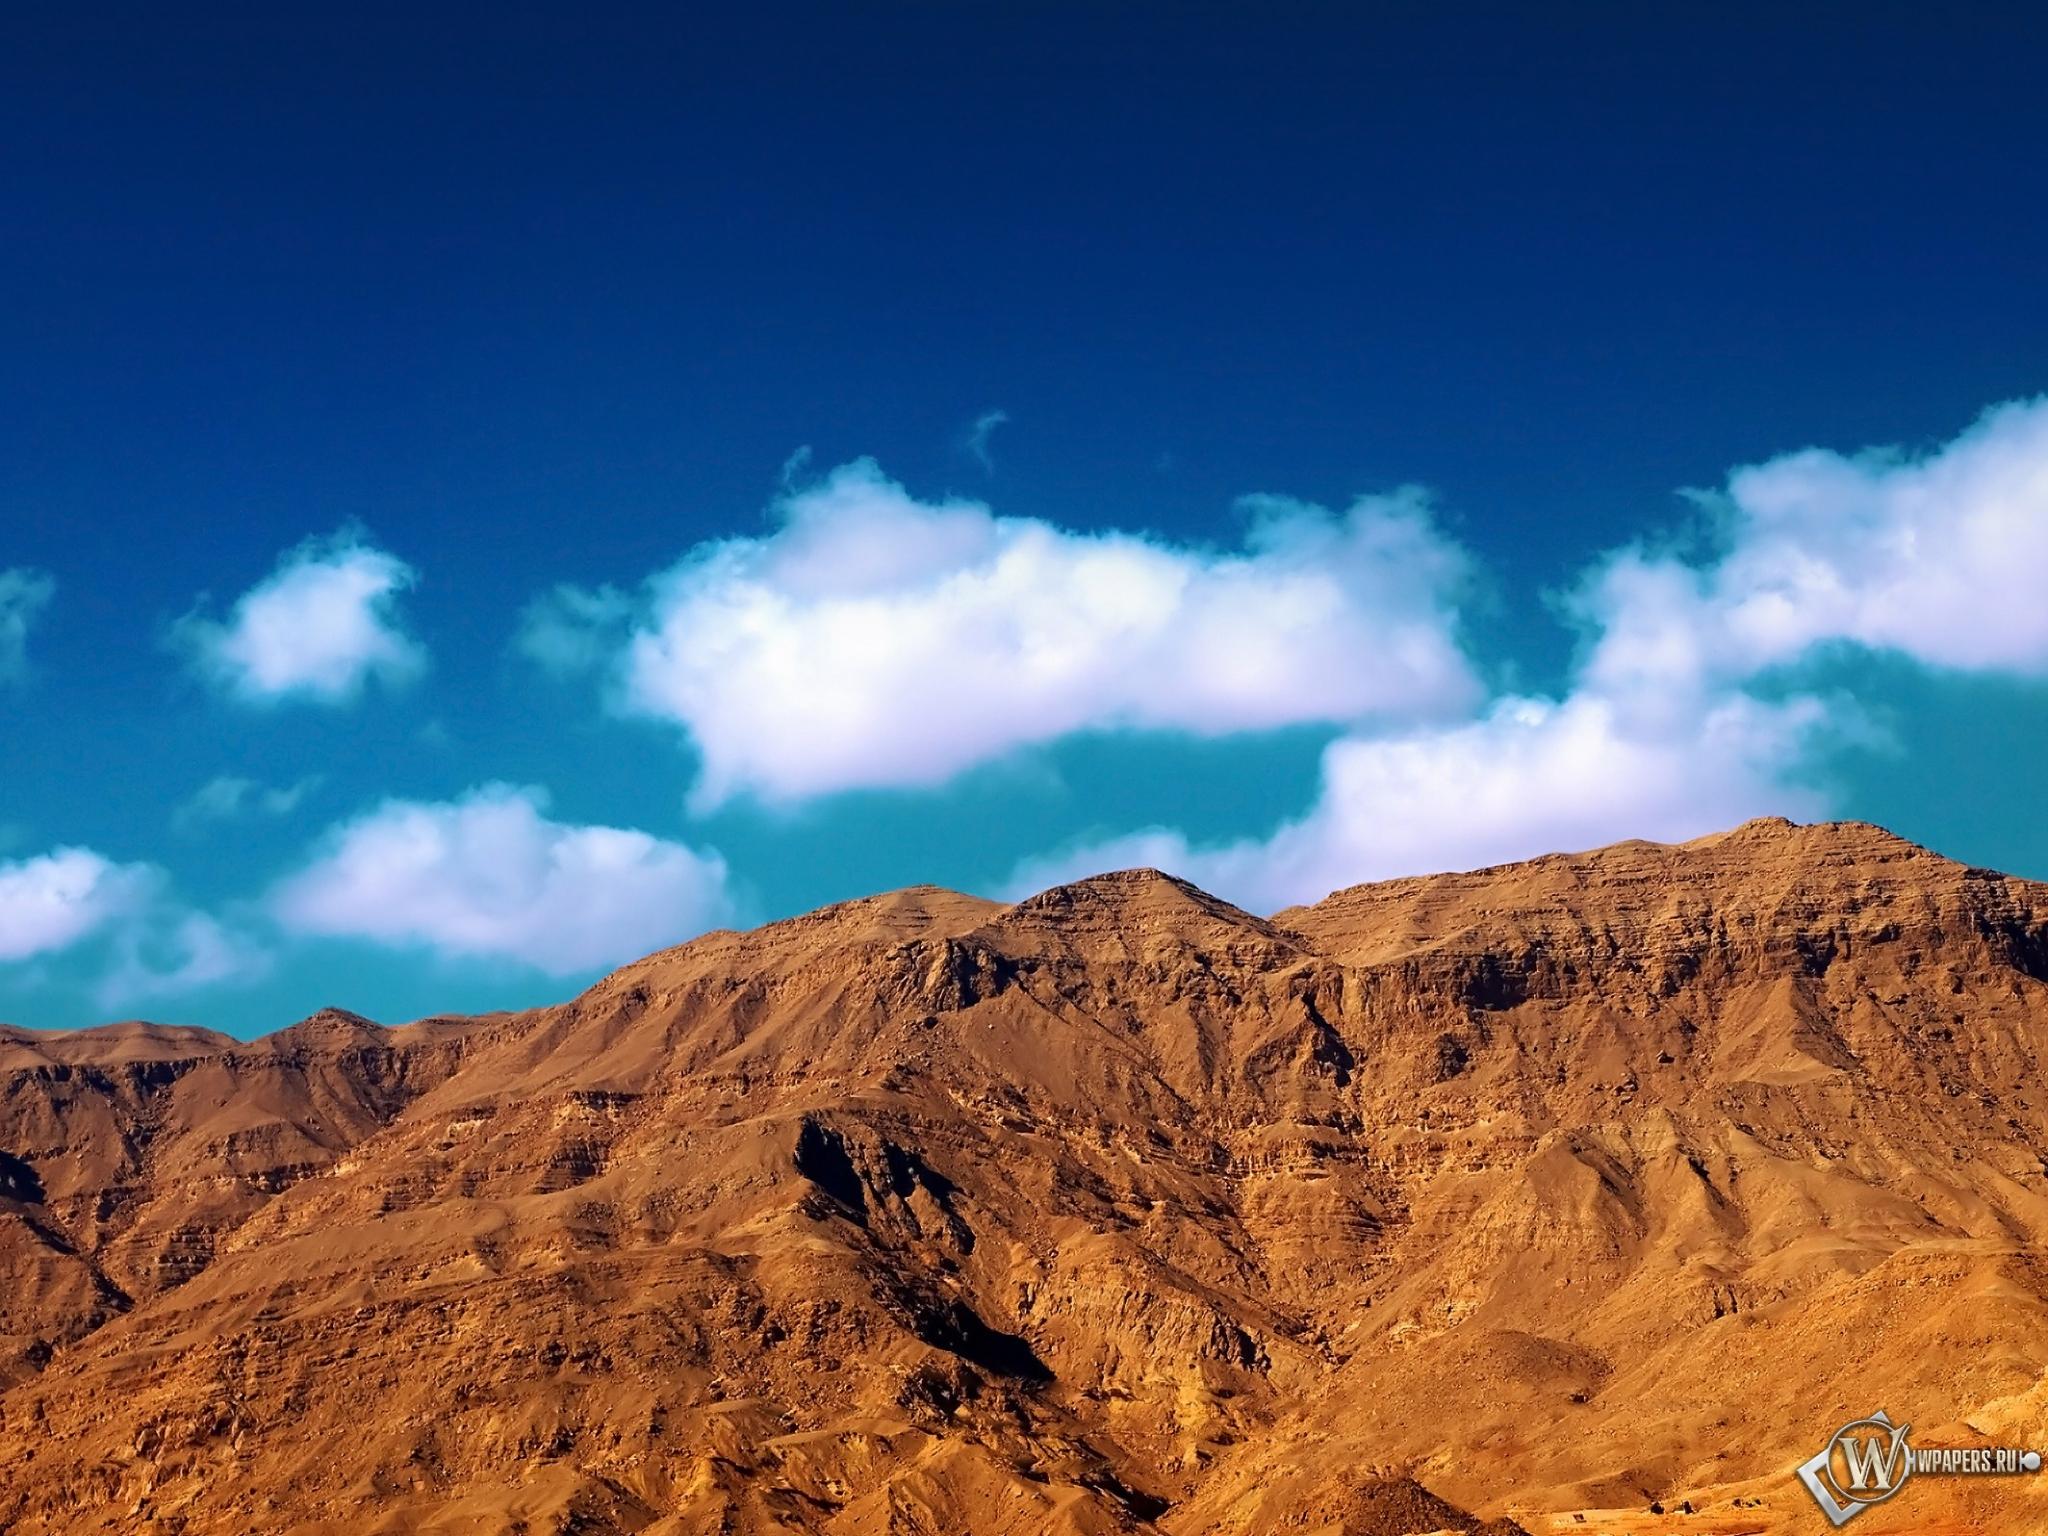 Ataqa mountain 2048x1536